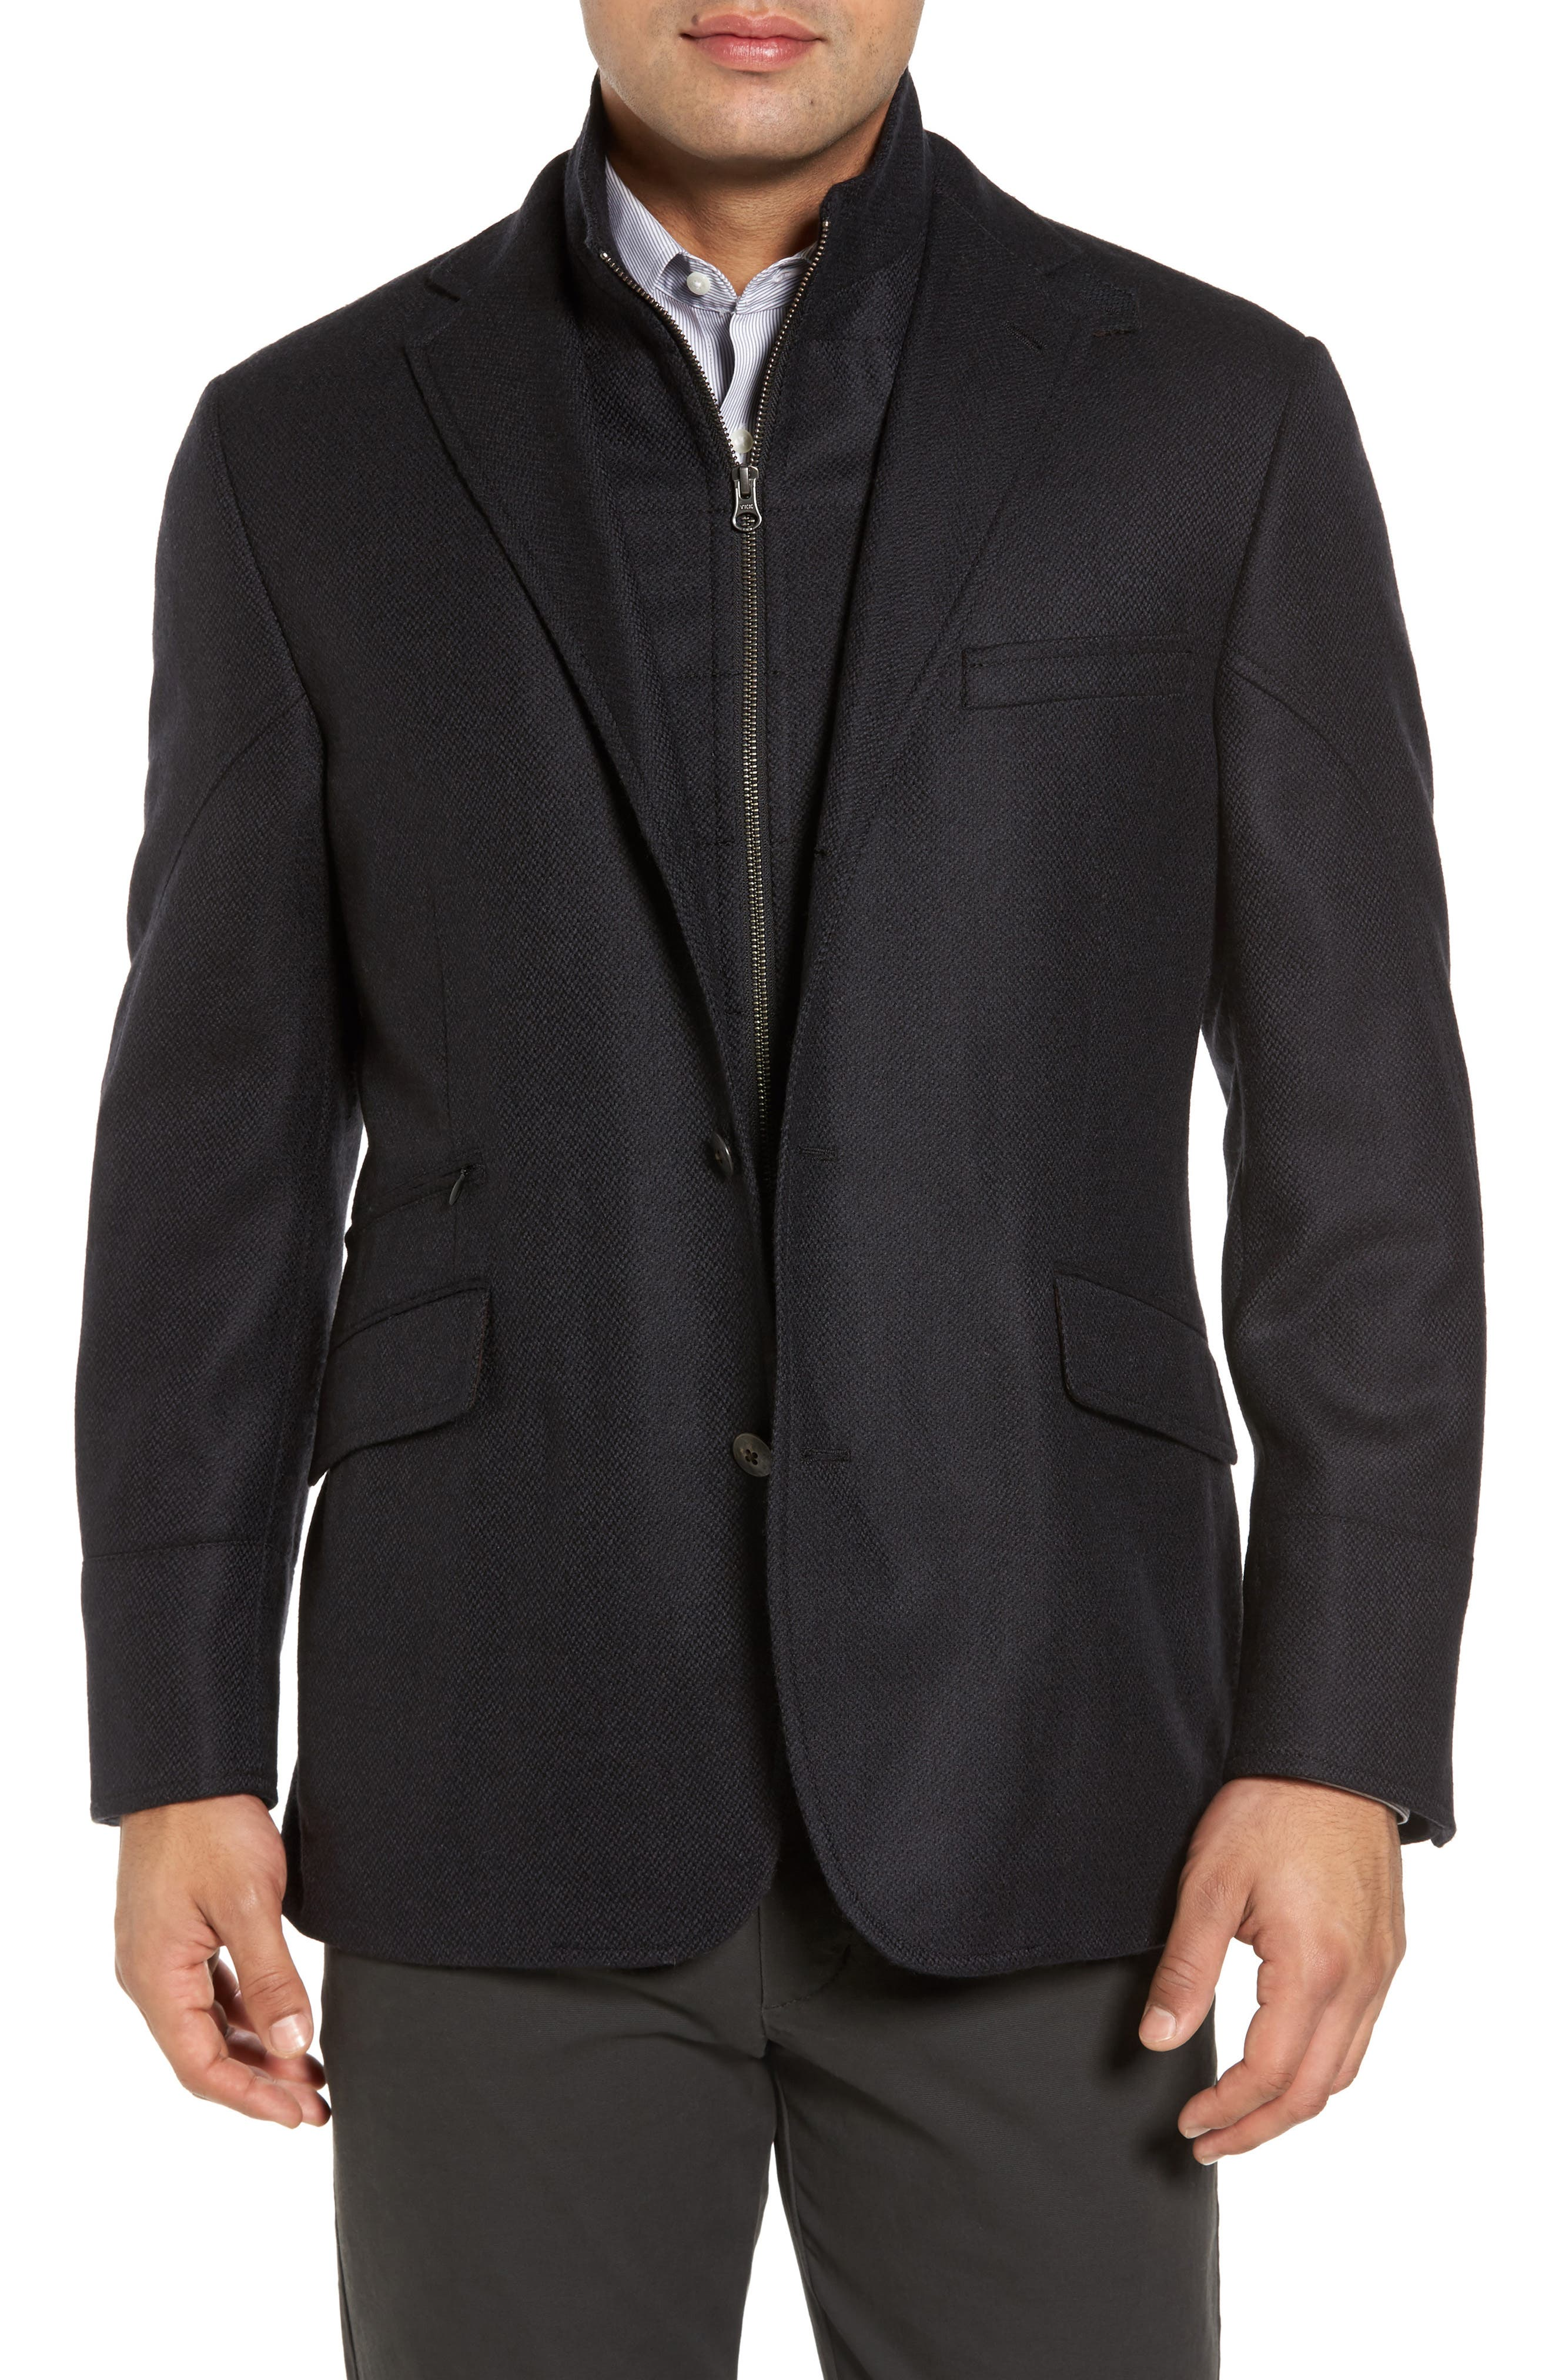 Ritchie Aim Hybrid Classic Fit Wool & Cashmere Sport Coat,                             Main thumbnail 1, color,                             Black